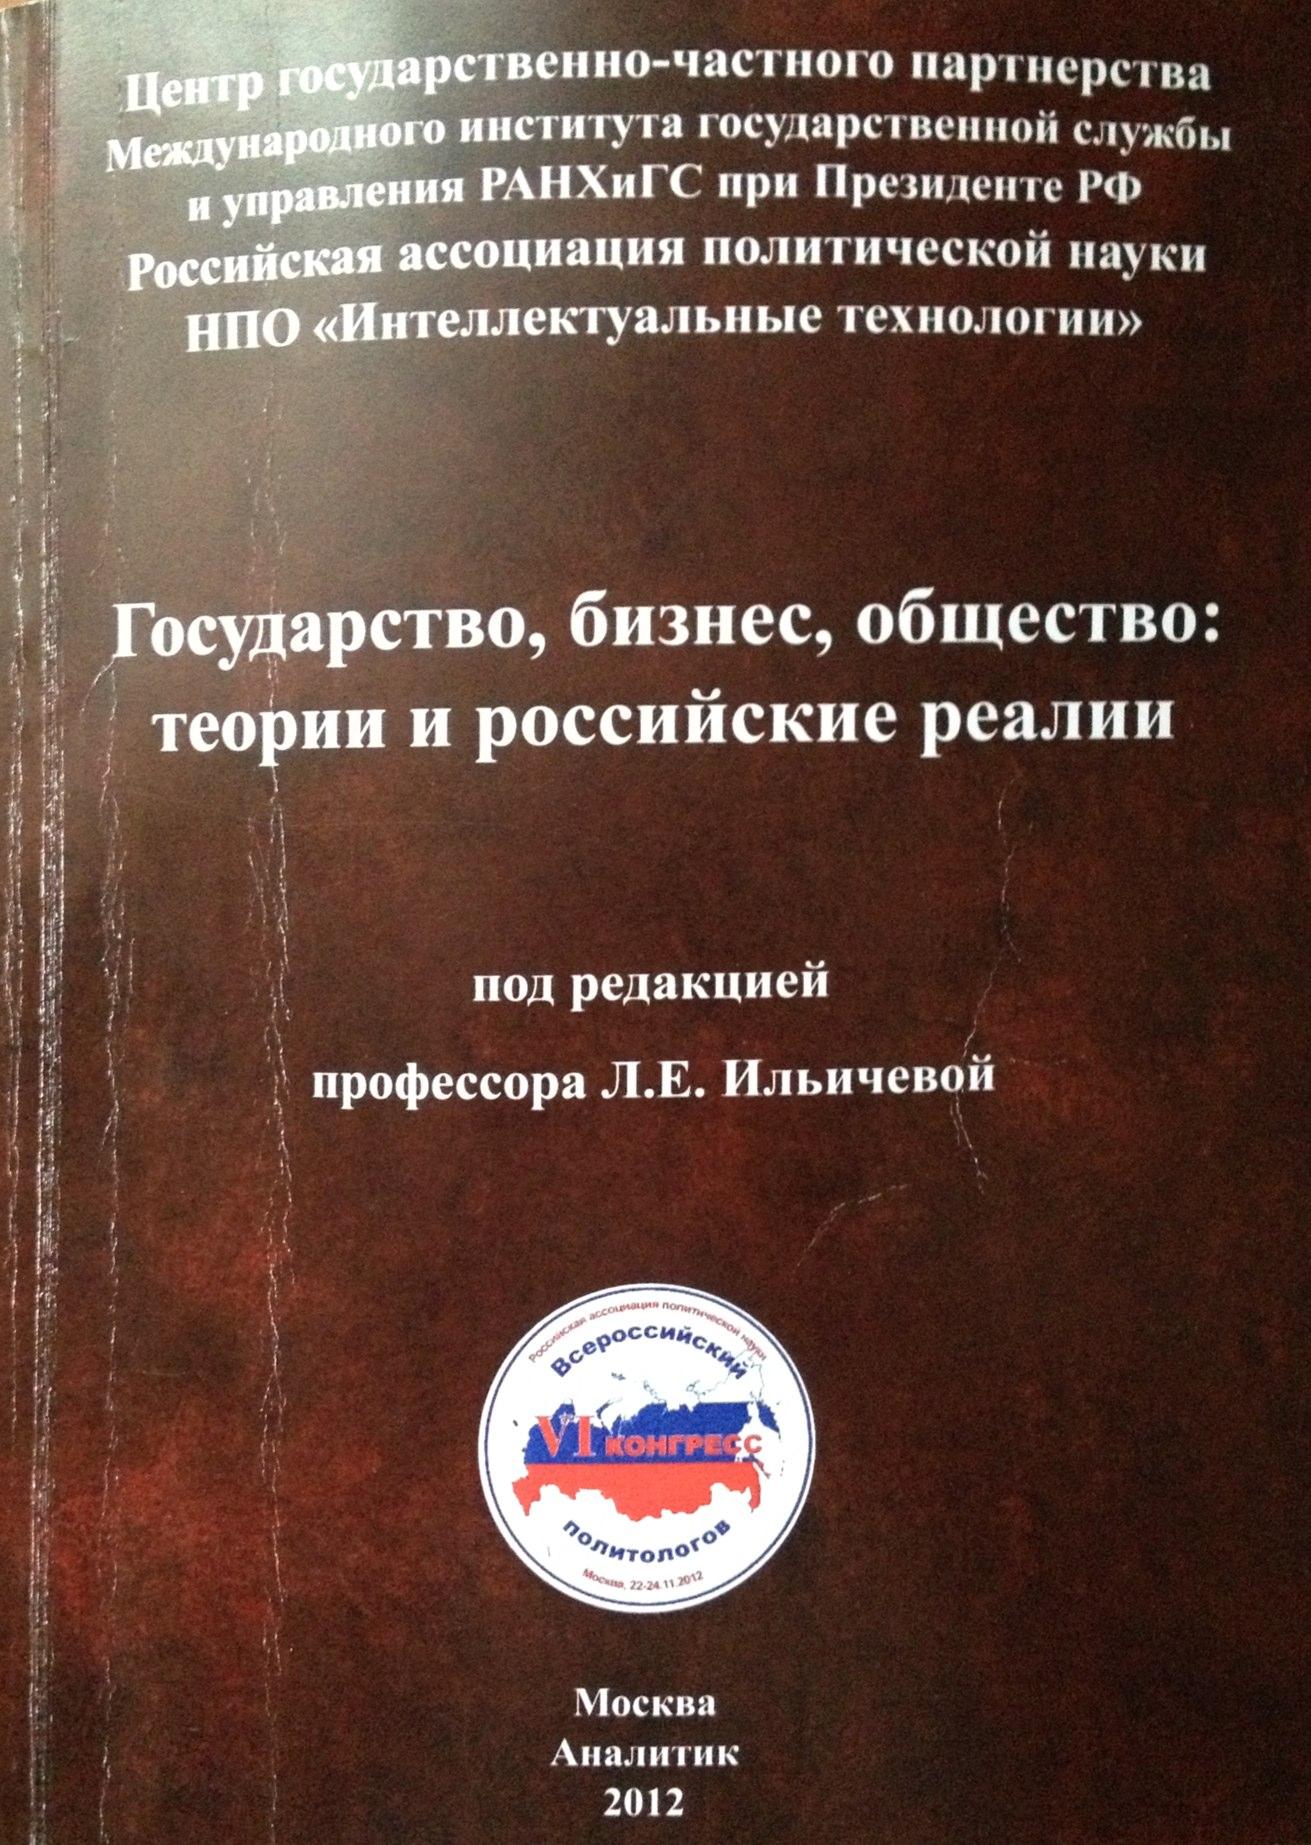 Государство, бизнес, общество: теории и российские реалии